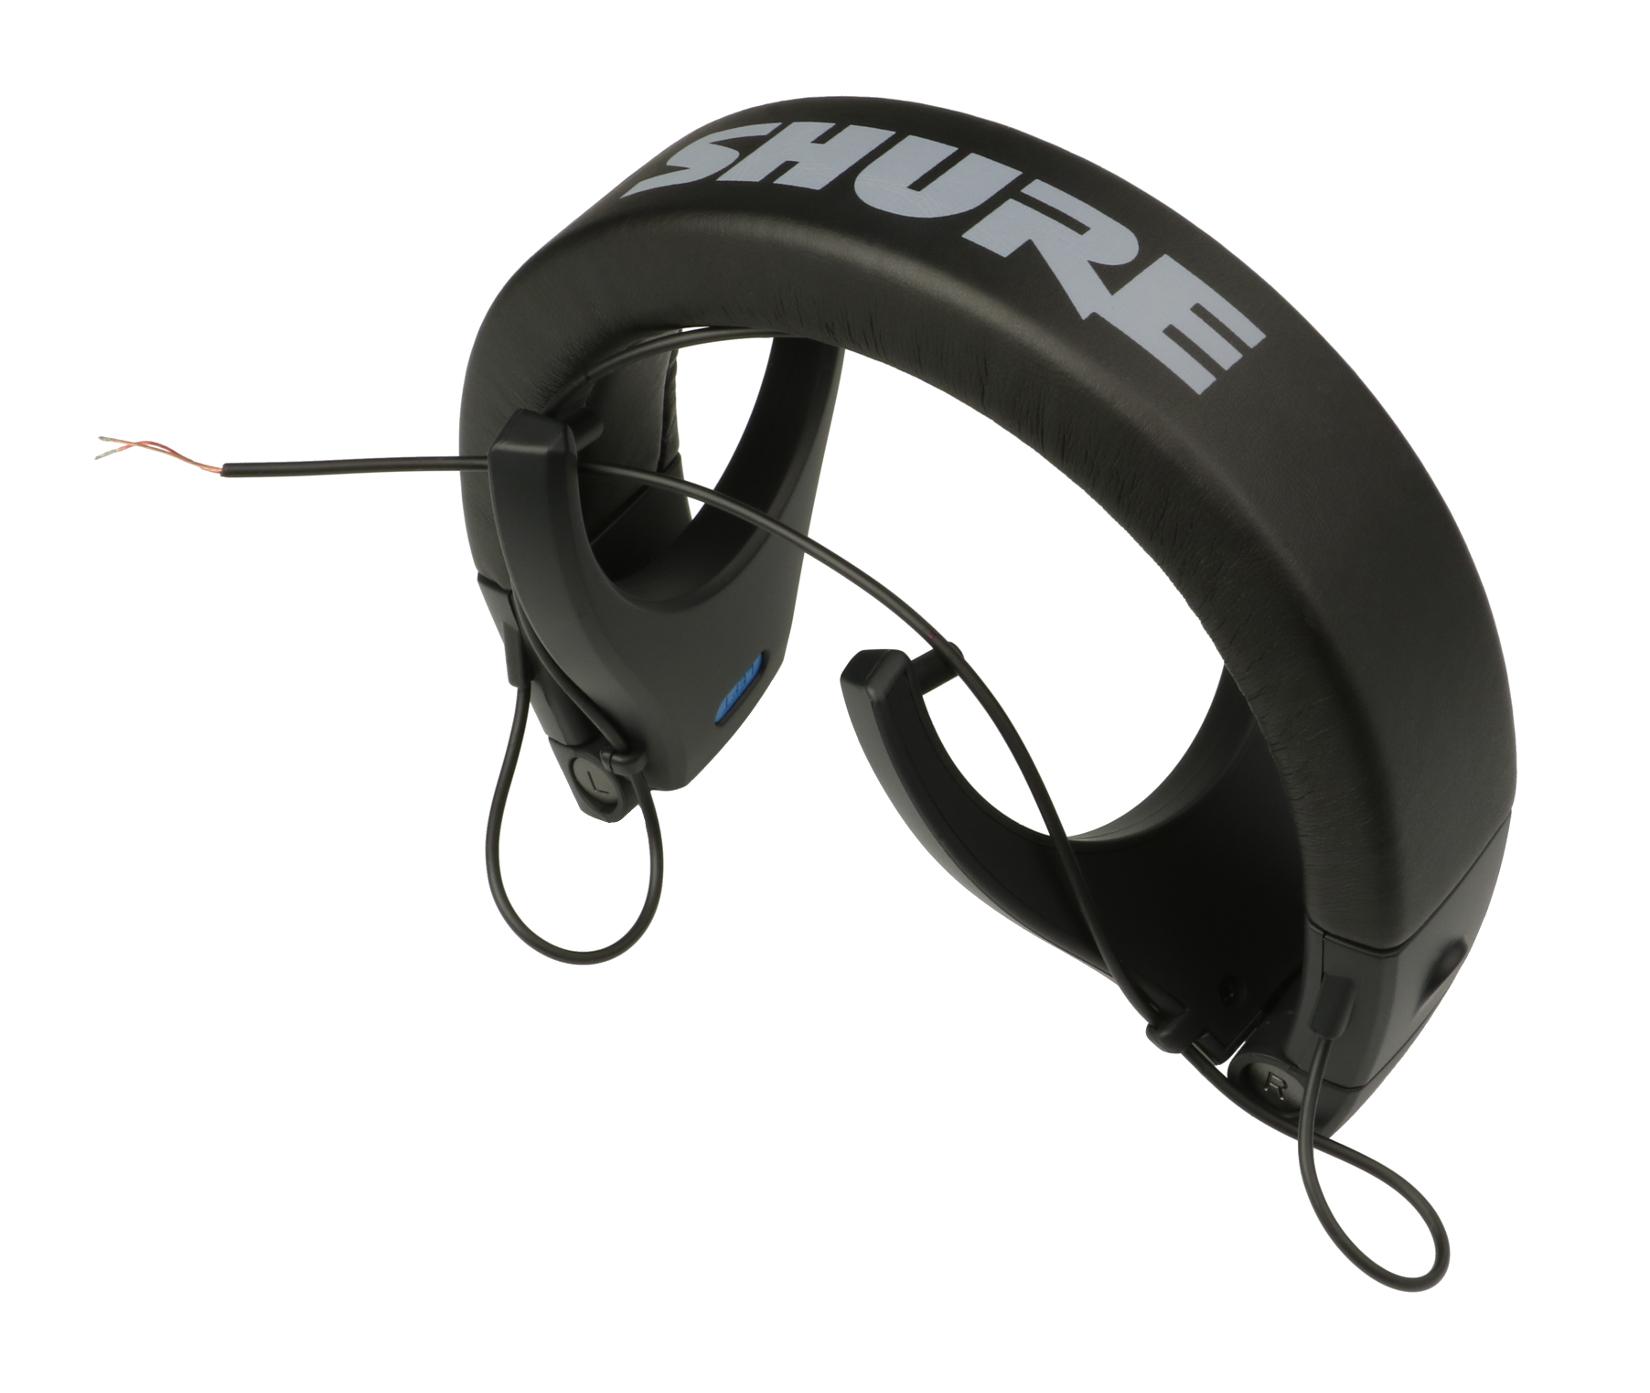 522d8804098 Shure RPH440 Headband Assembly For SRH440 | Full Compass Systems